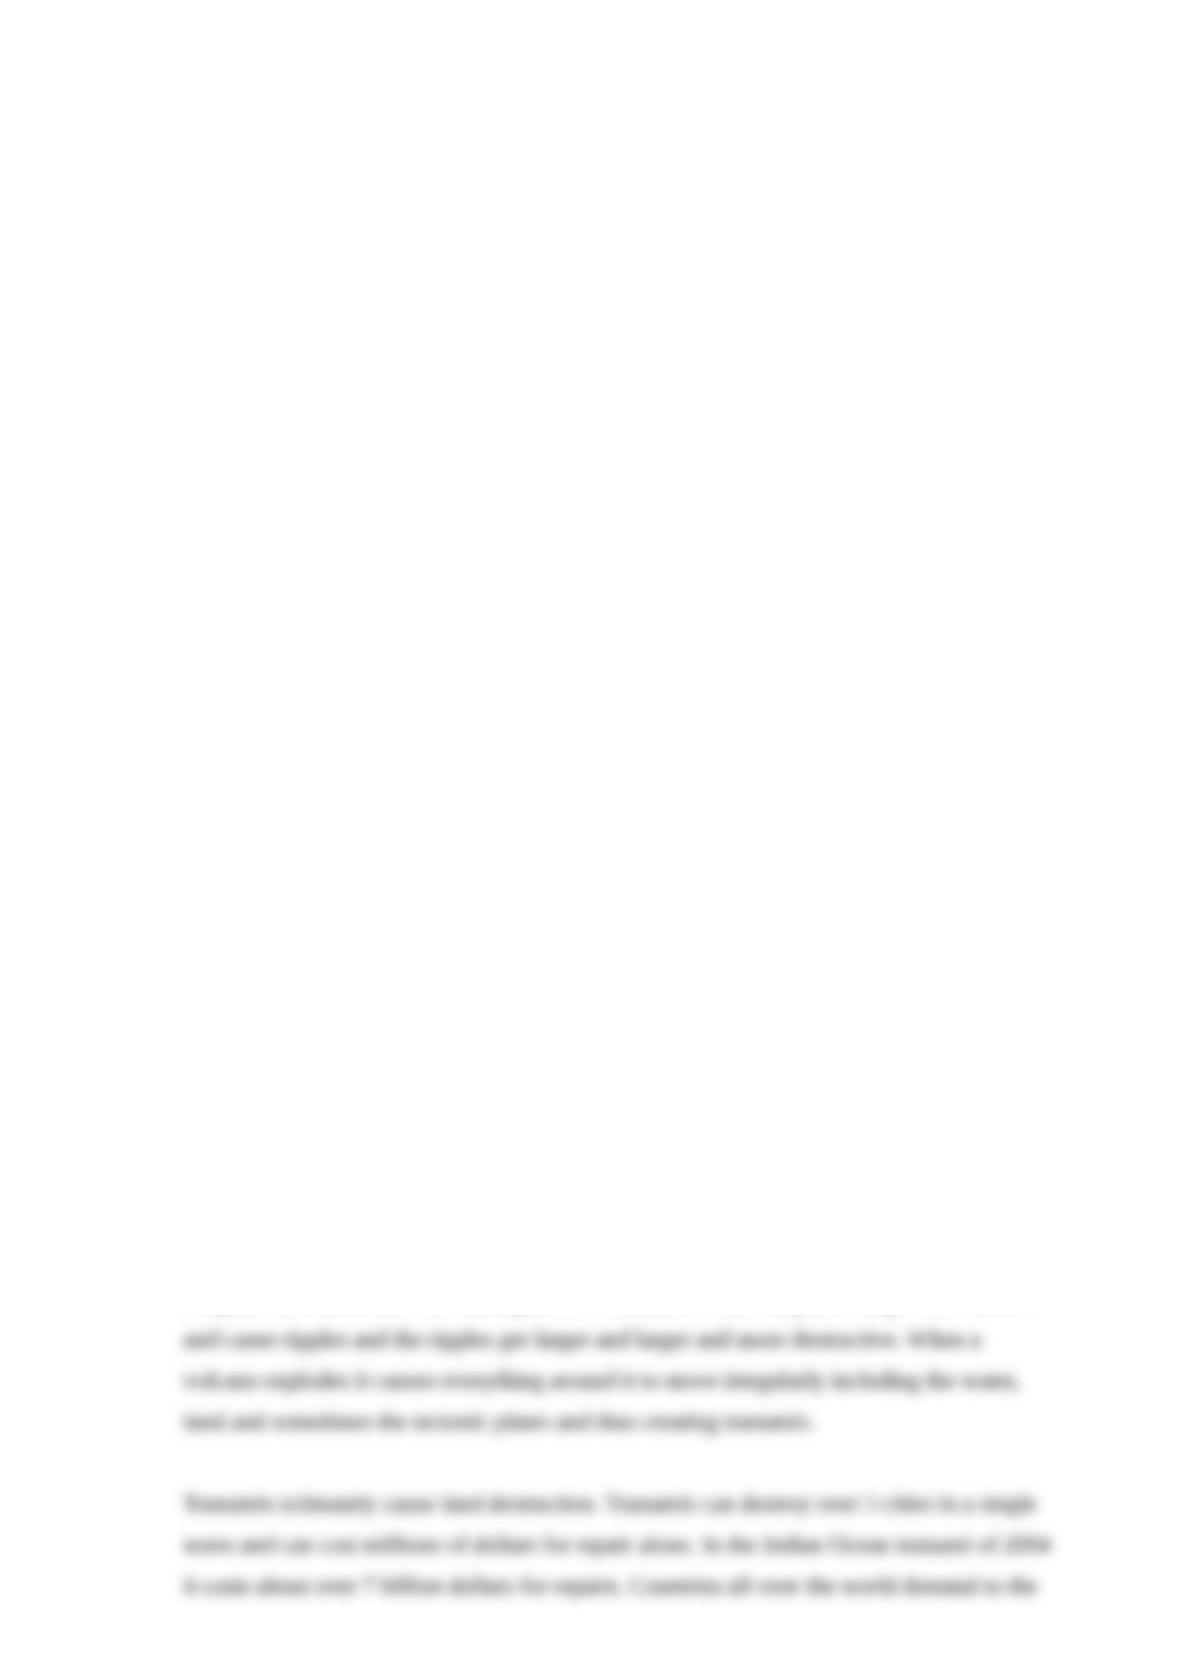 Audioprothesistes du quebec